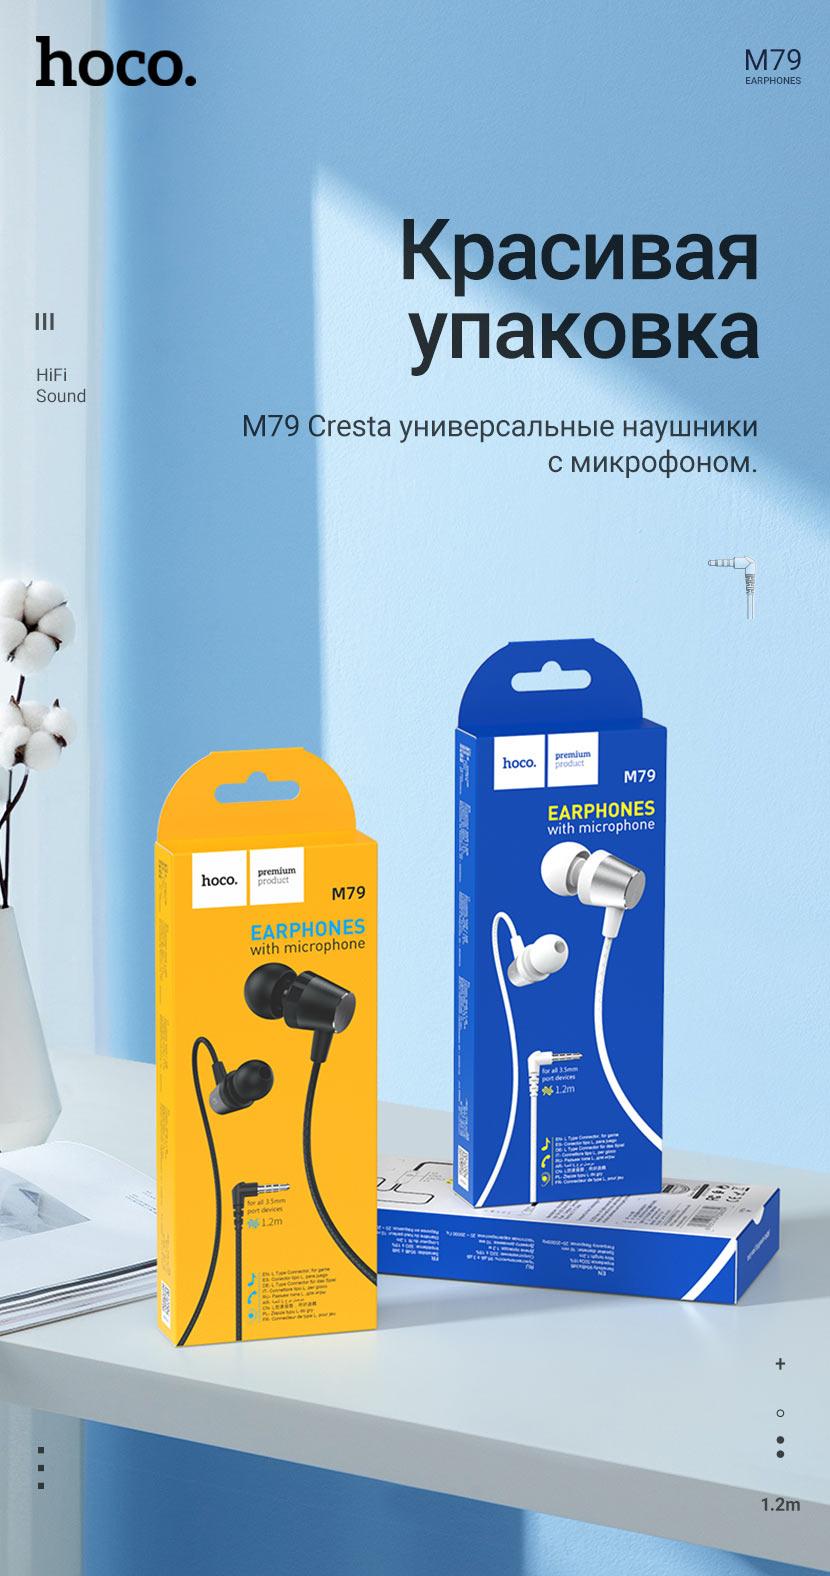 hoco news m79 cresta universal earphones with microphone package ru